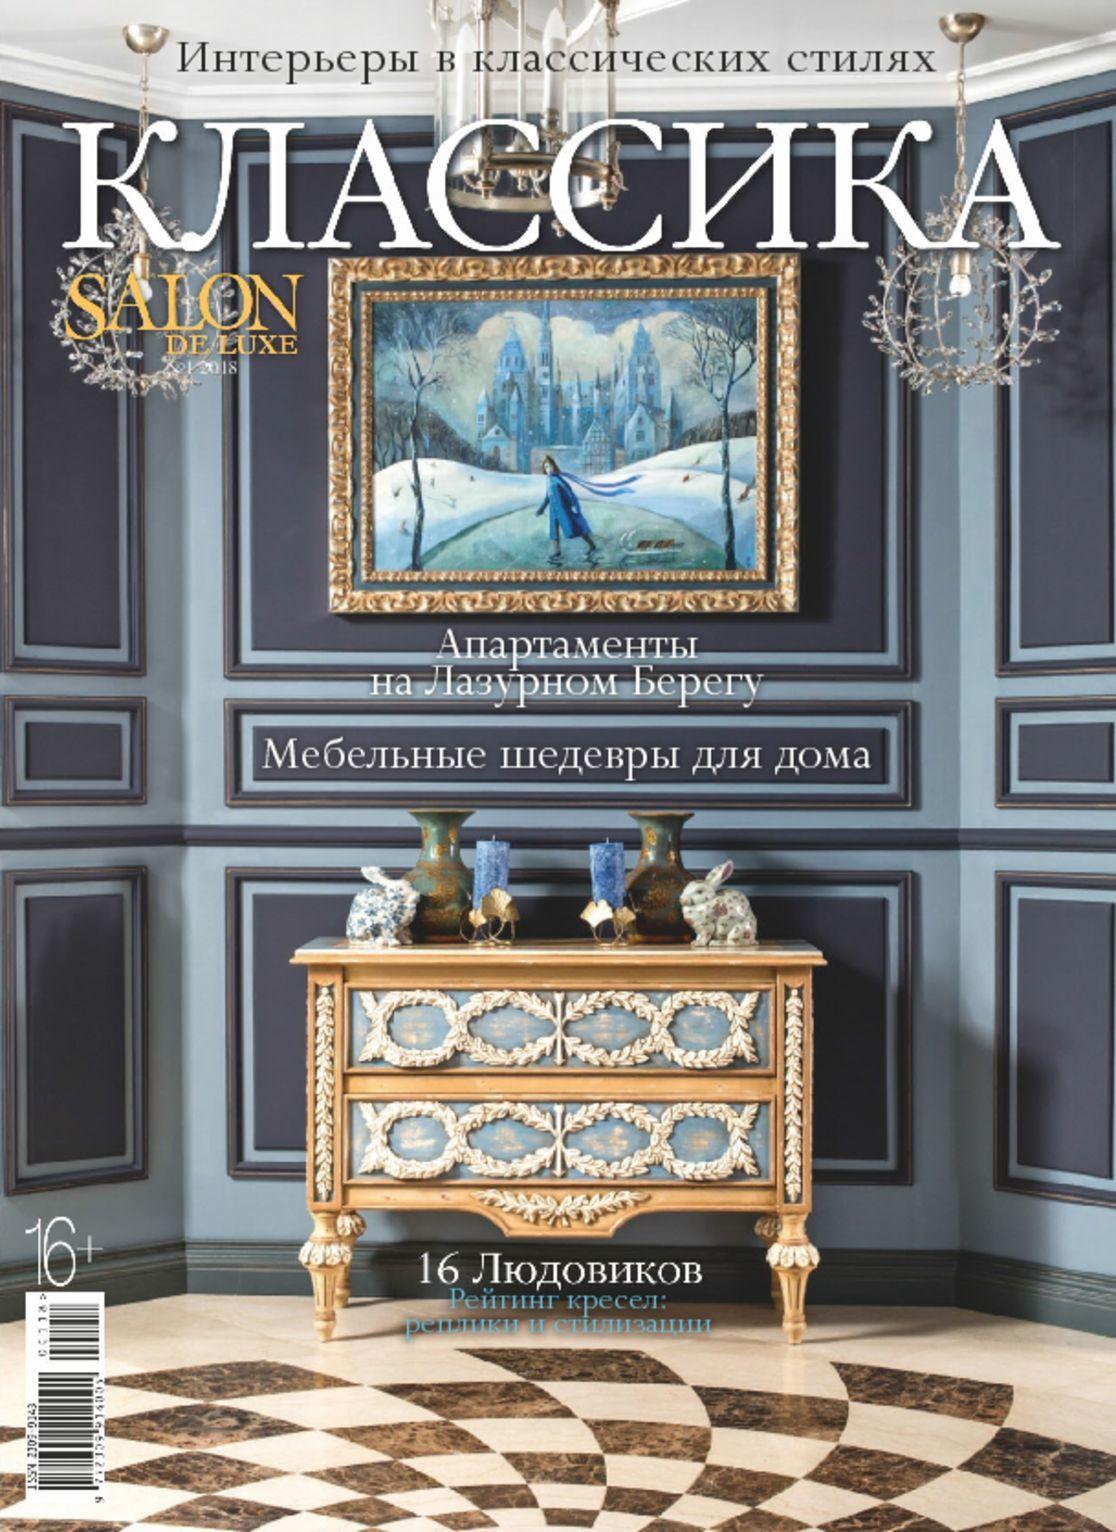 Salon de luxe classic magazine digital for Salon luxe